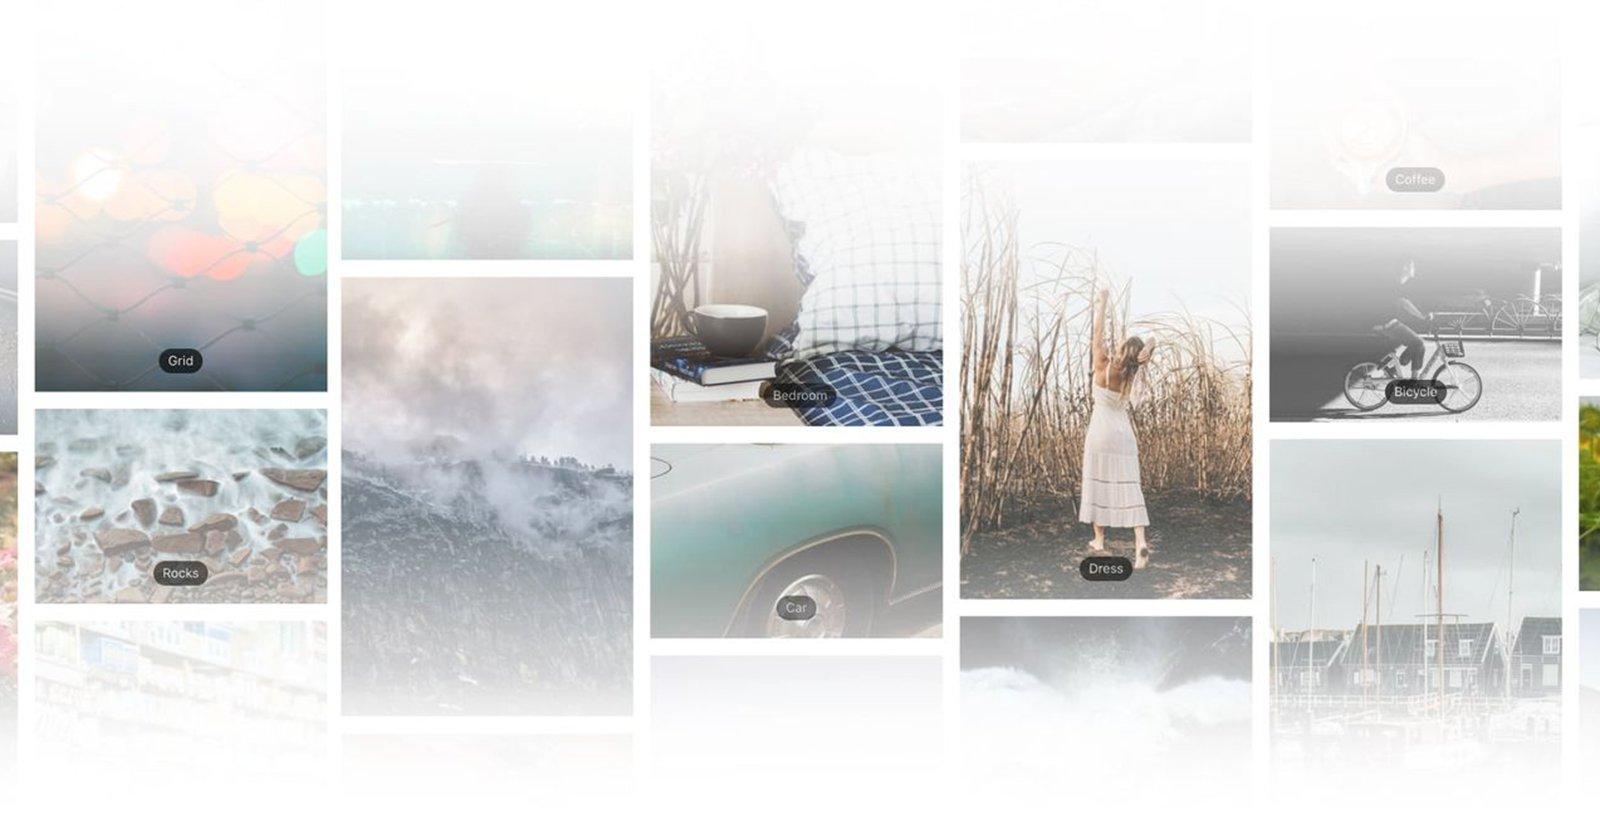 Unsplash Releases 2 Million Images as Massive Open-Source Dataset